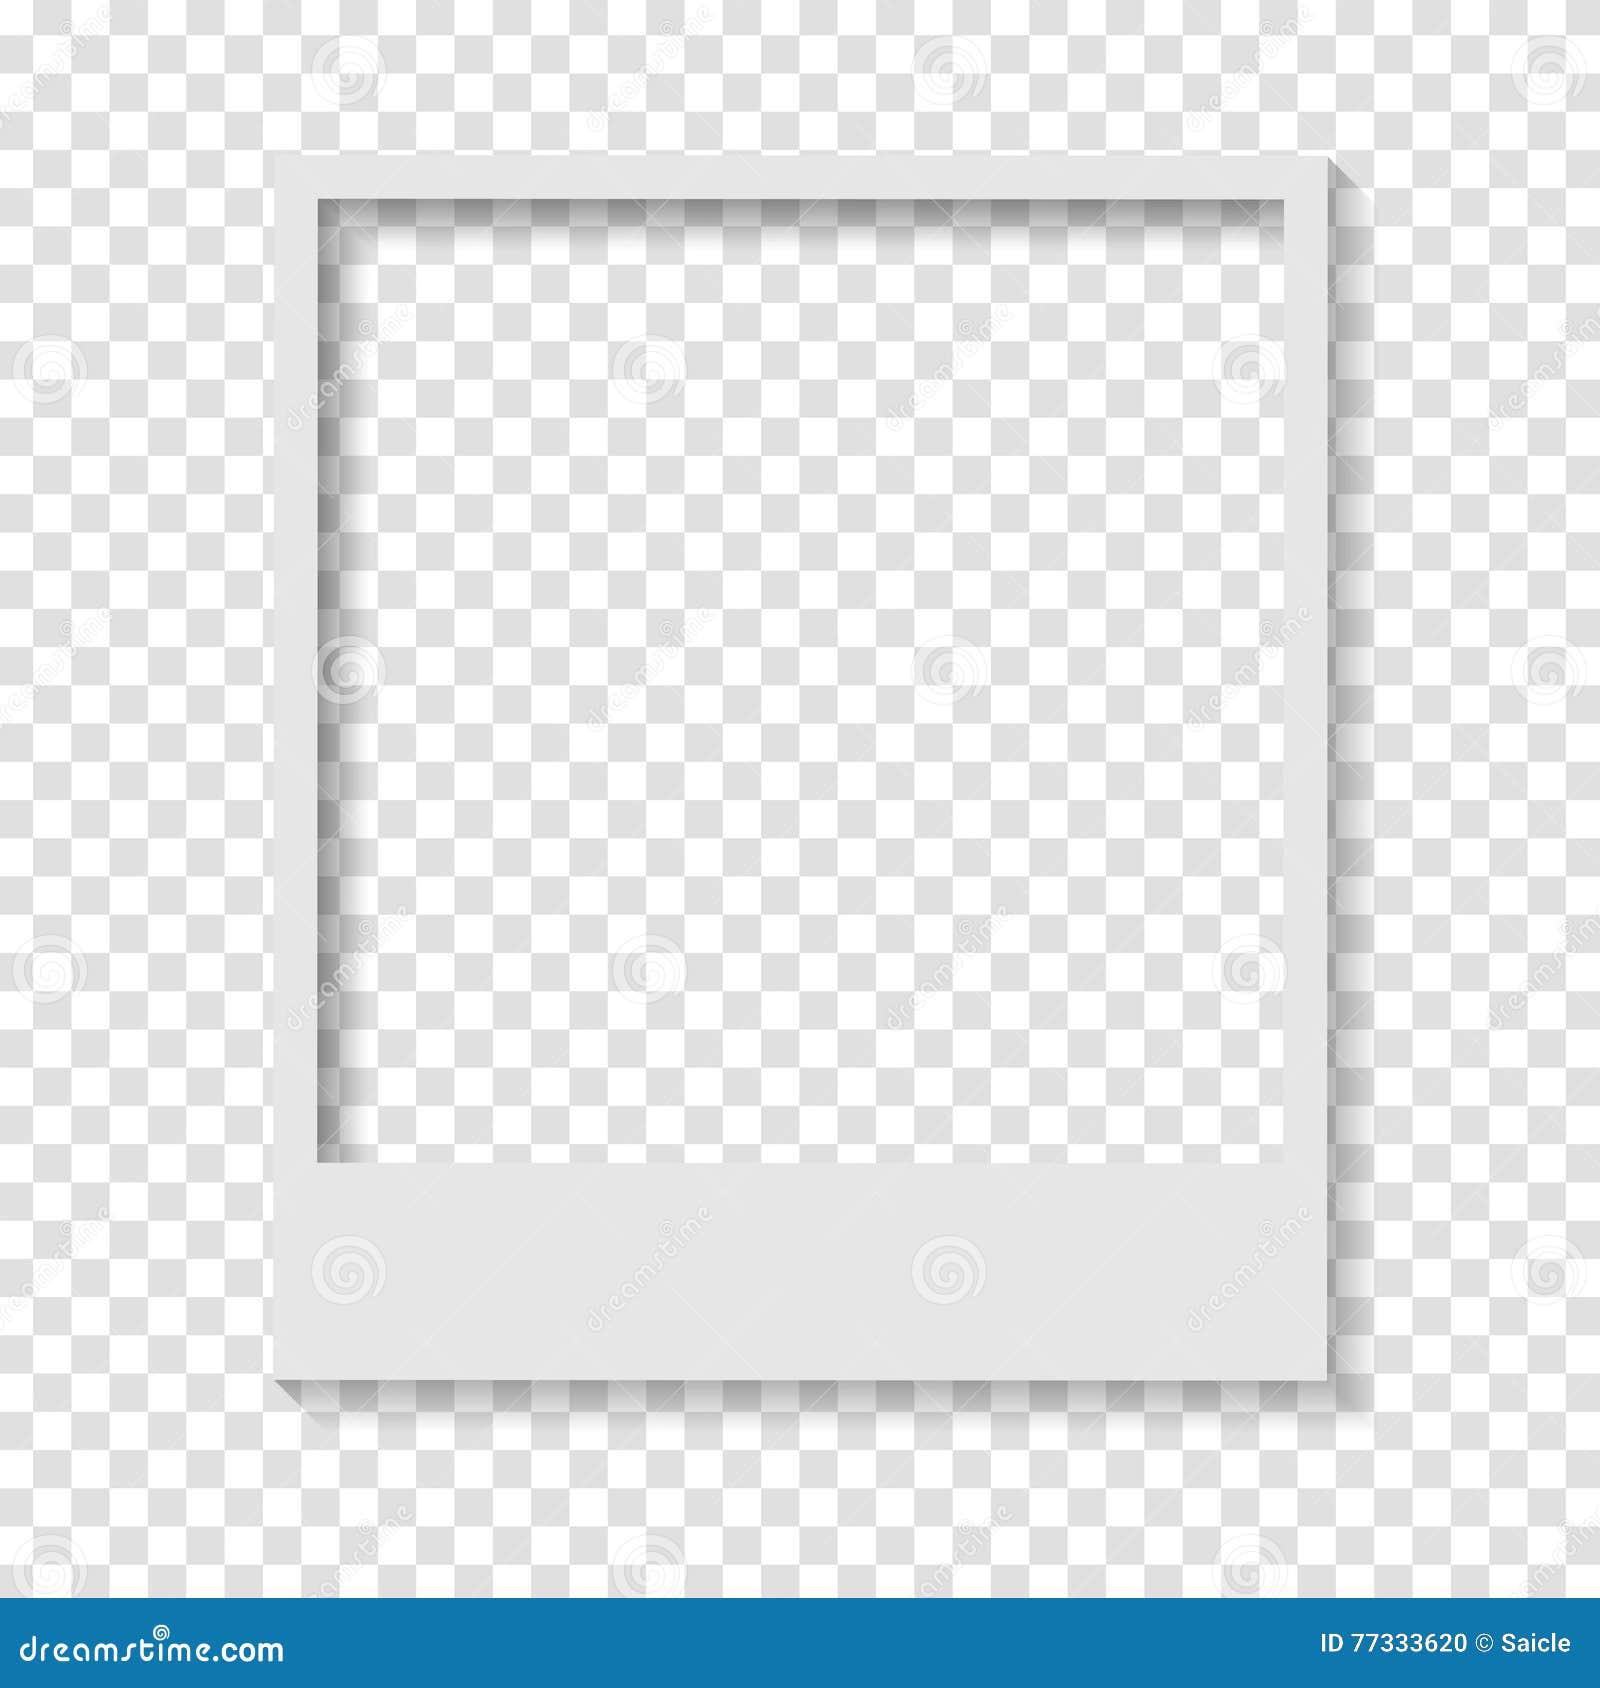 Blank Transparent Paper Polaroid Photo Frame Stock Vector ...